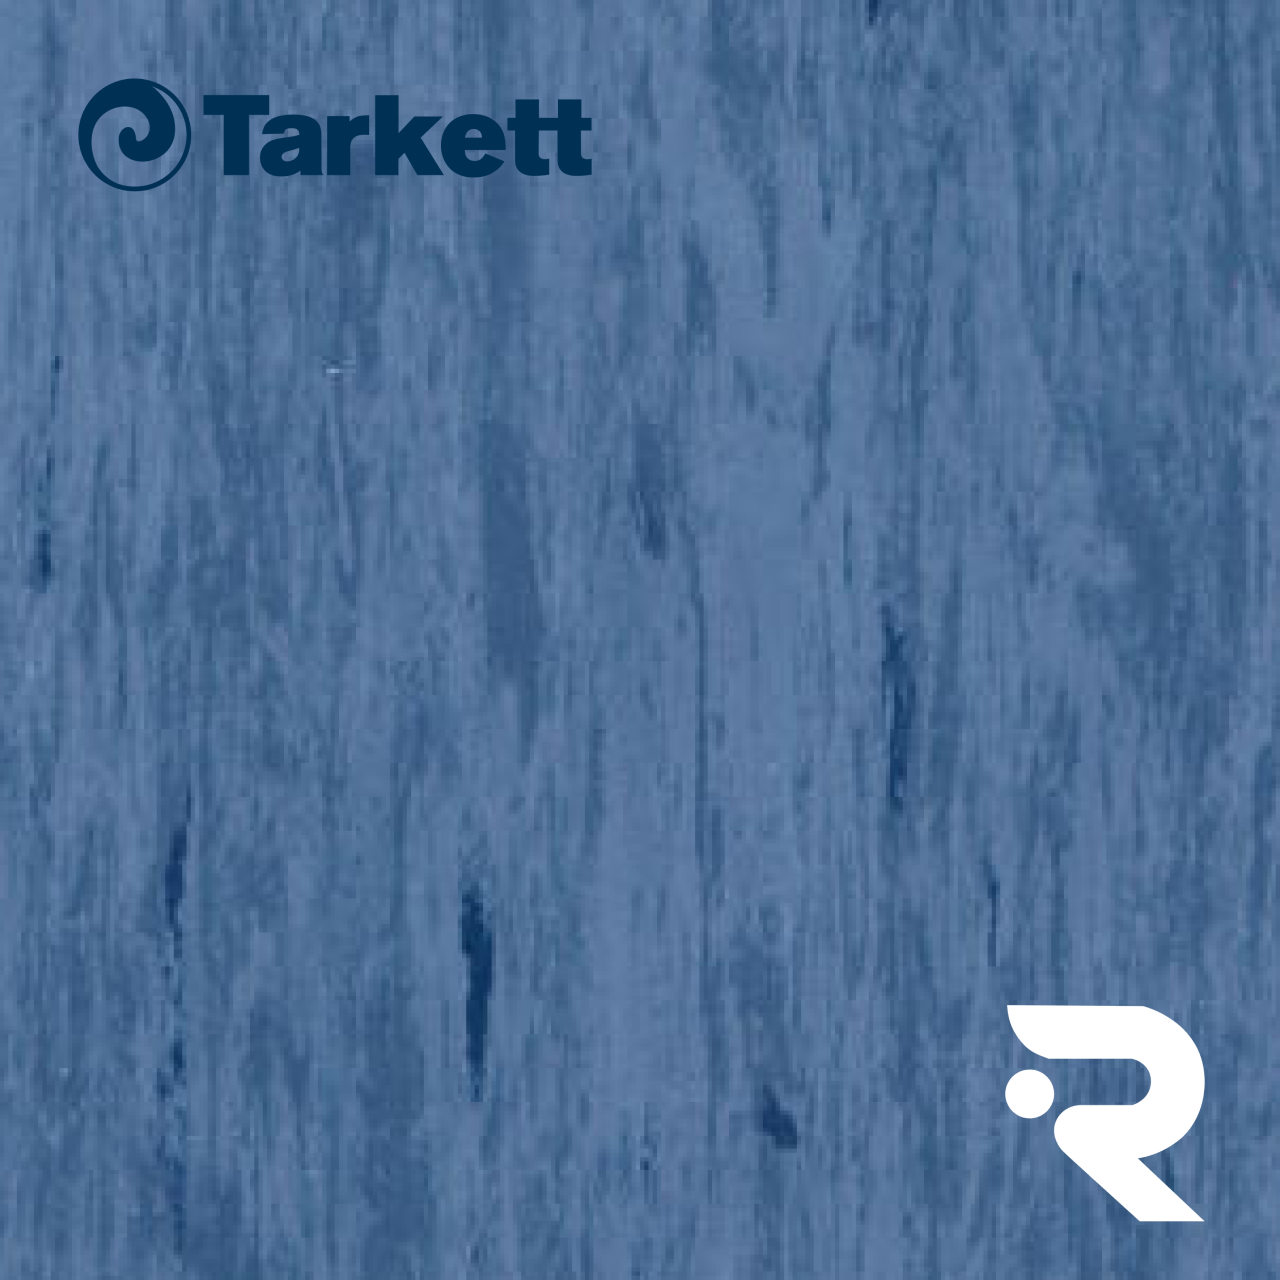 🏫 Гомогенный линолеум Tarkett   Standard DARK BLUE 0493   Standard Plus 2.0 mm   2 х 23 м